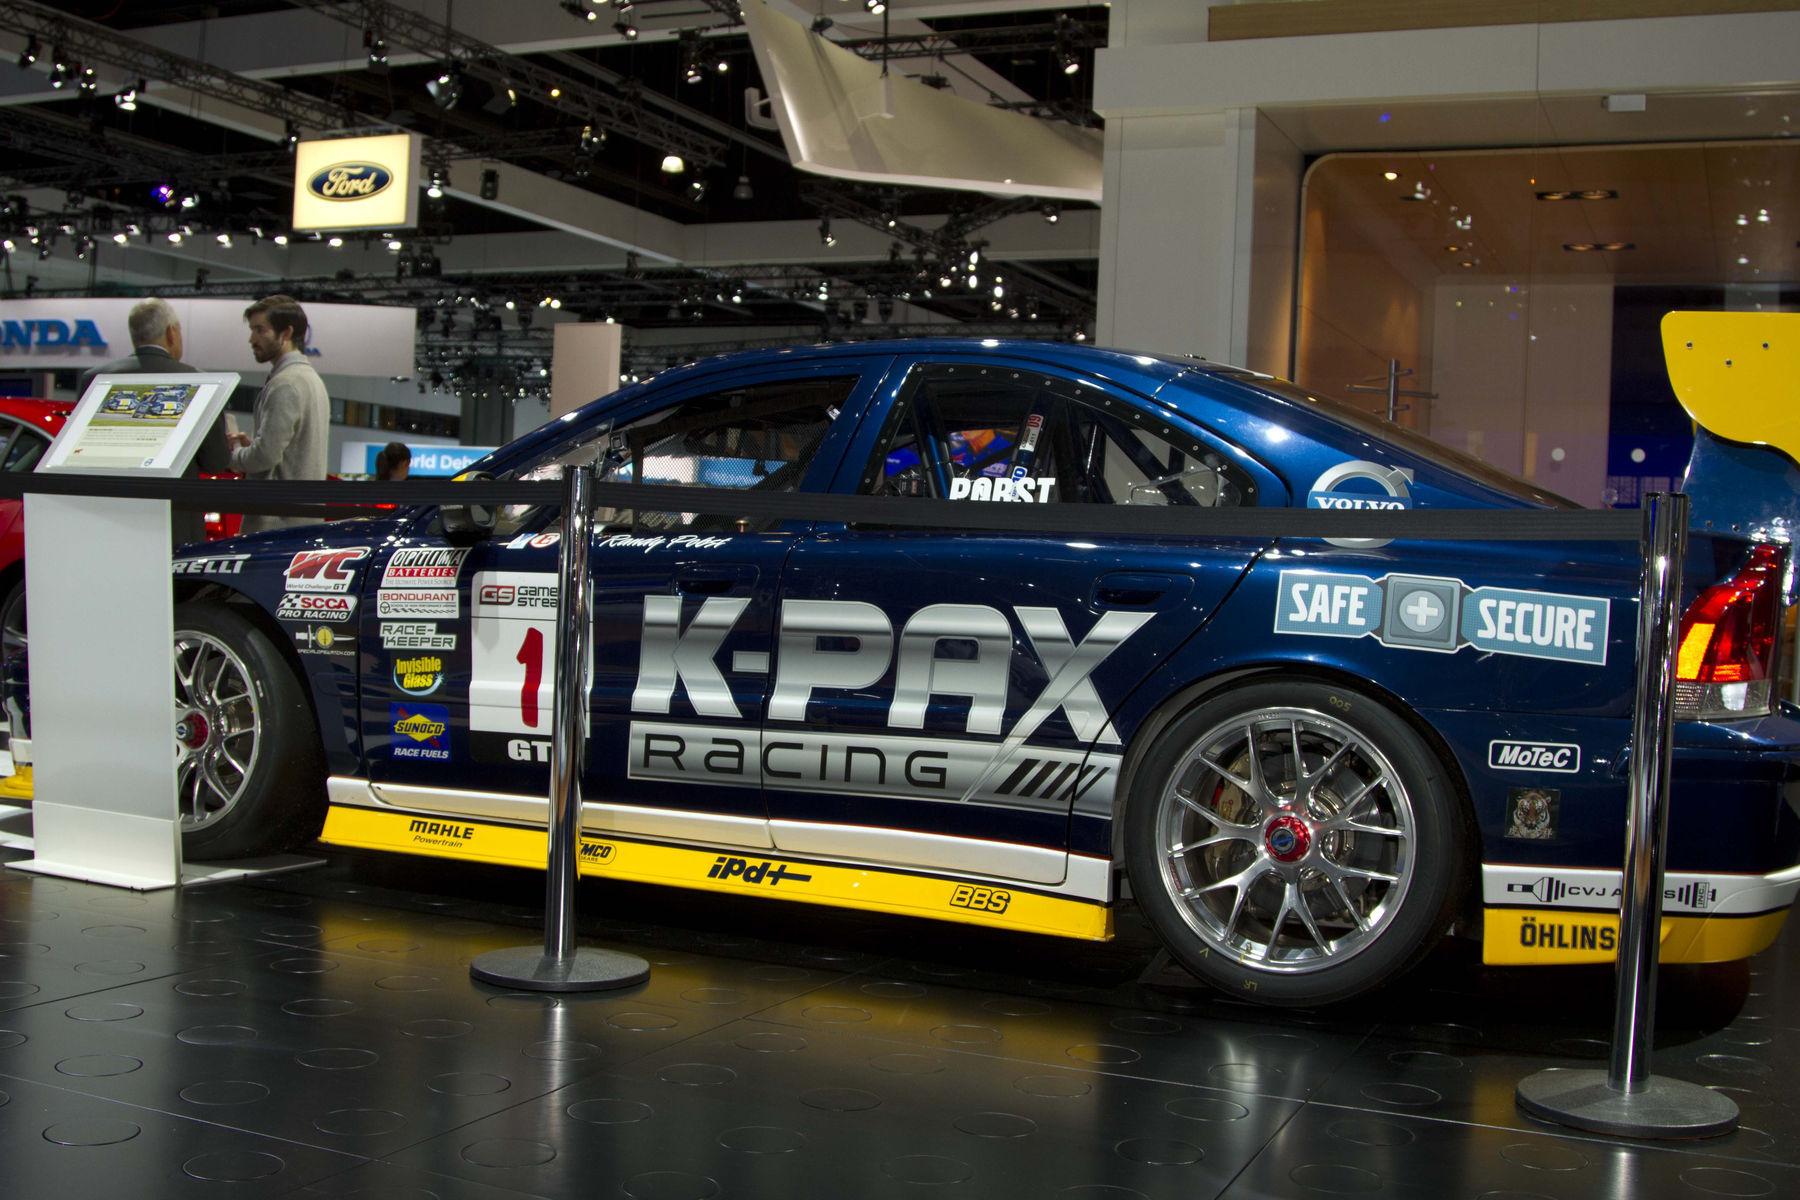 2010 Volvo S60 | K-Pax 2010 S60 GT